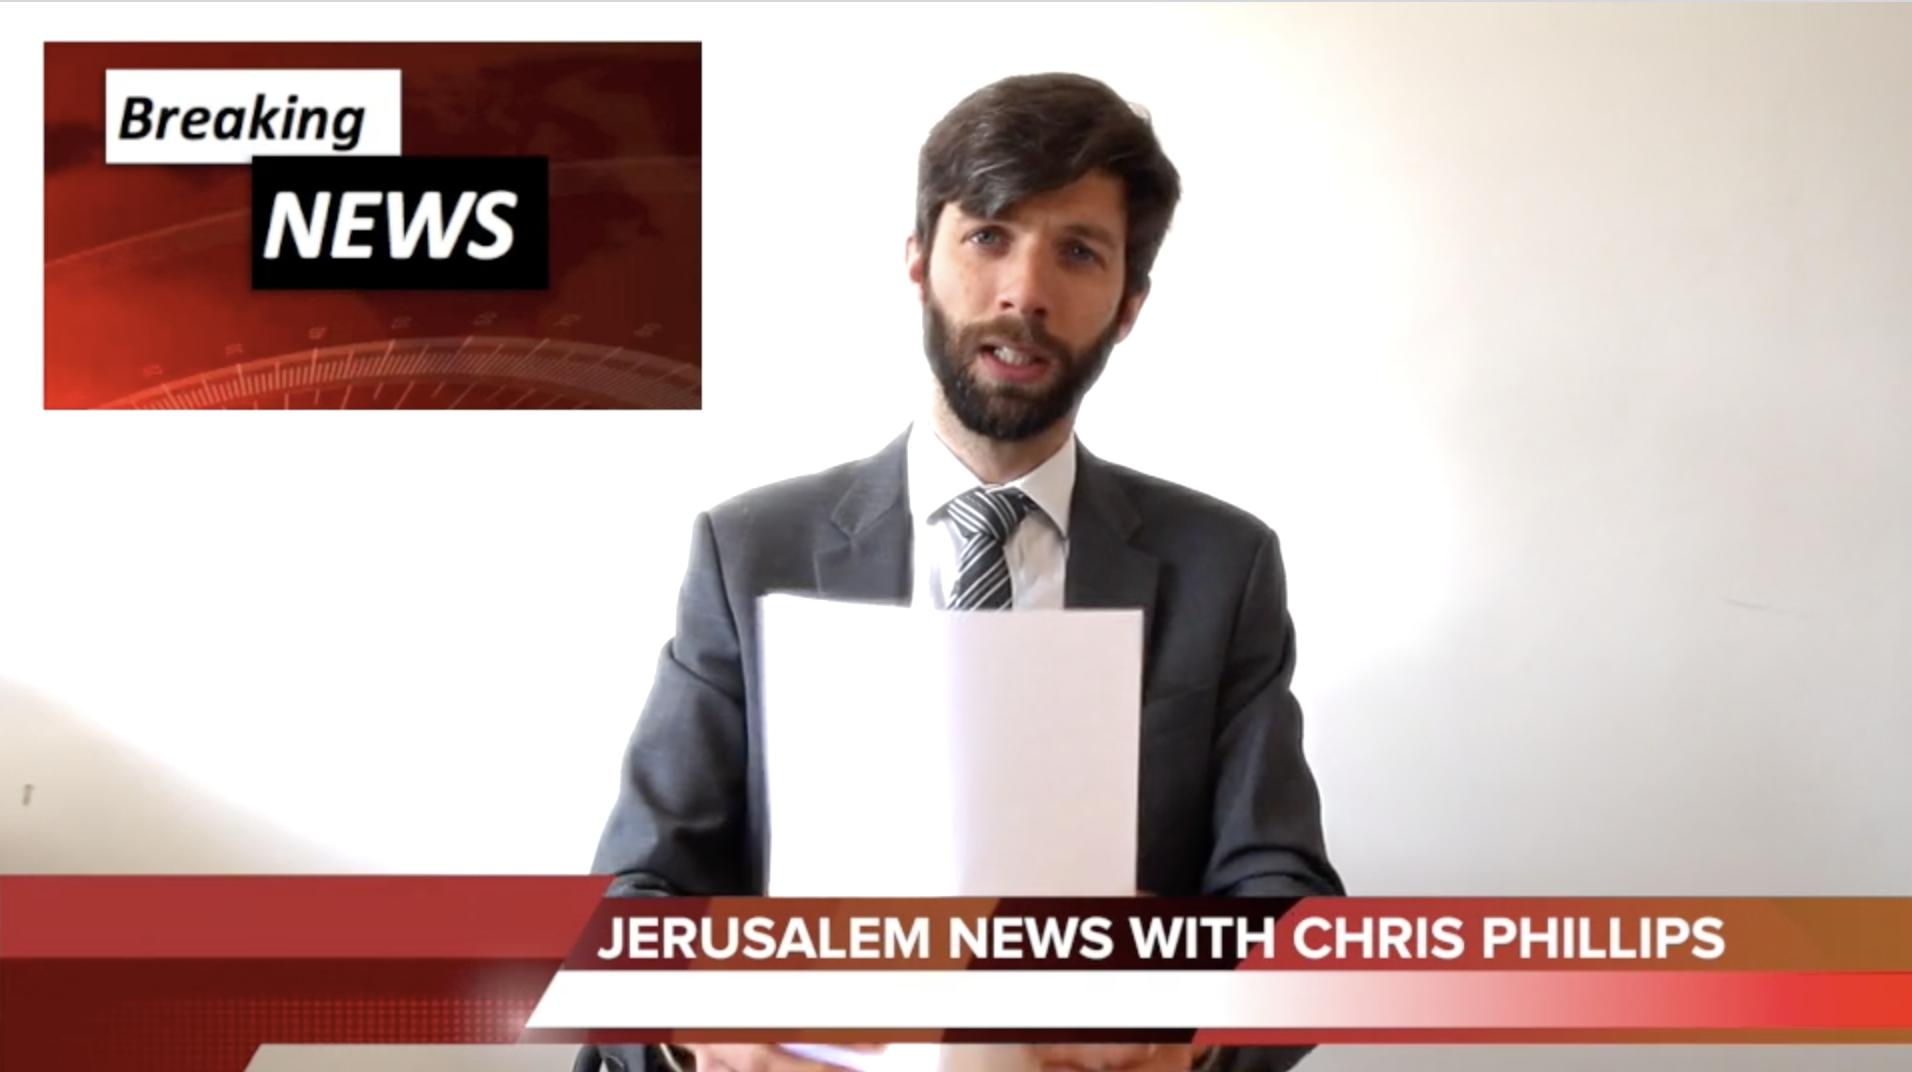 Crossteach Video - Jerusalem News